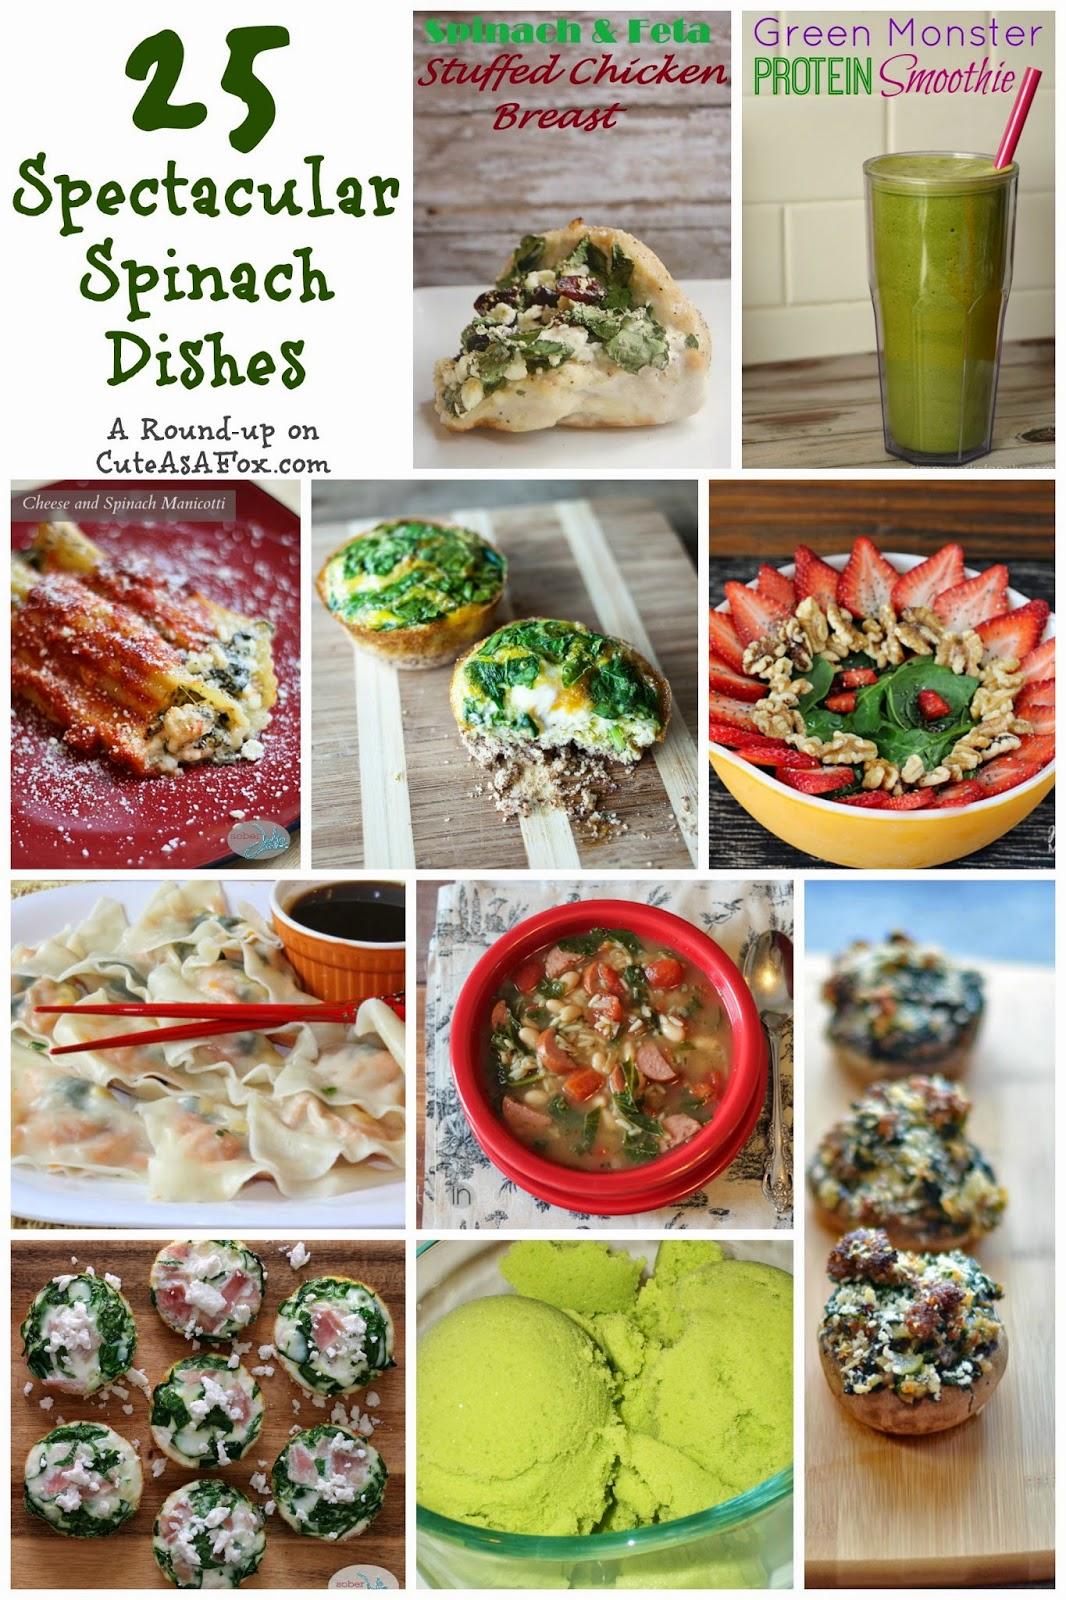 http://1.bp.blogspot.com/-vsae9EaNgLc/U6IR753T22I/AAAAAAAAJ0E/on-waNLgDUw/s1600/25-spinach-dishes-round-up.jpg